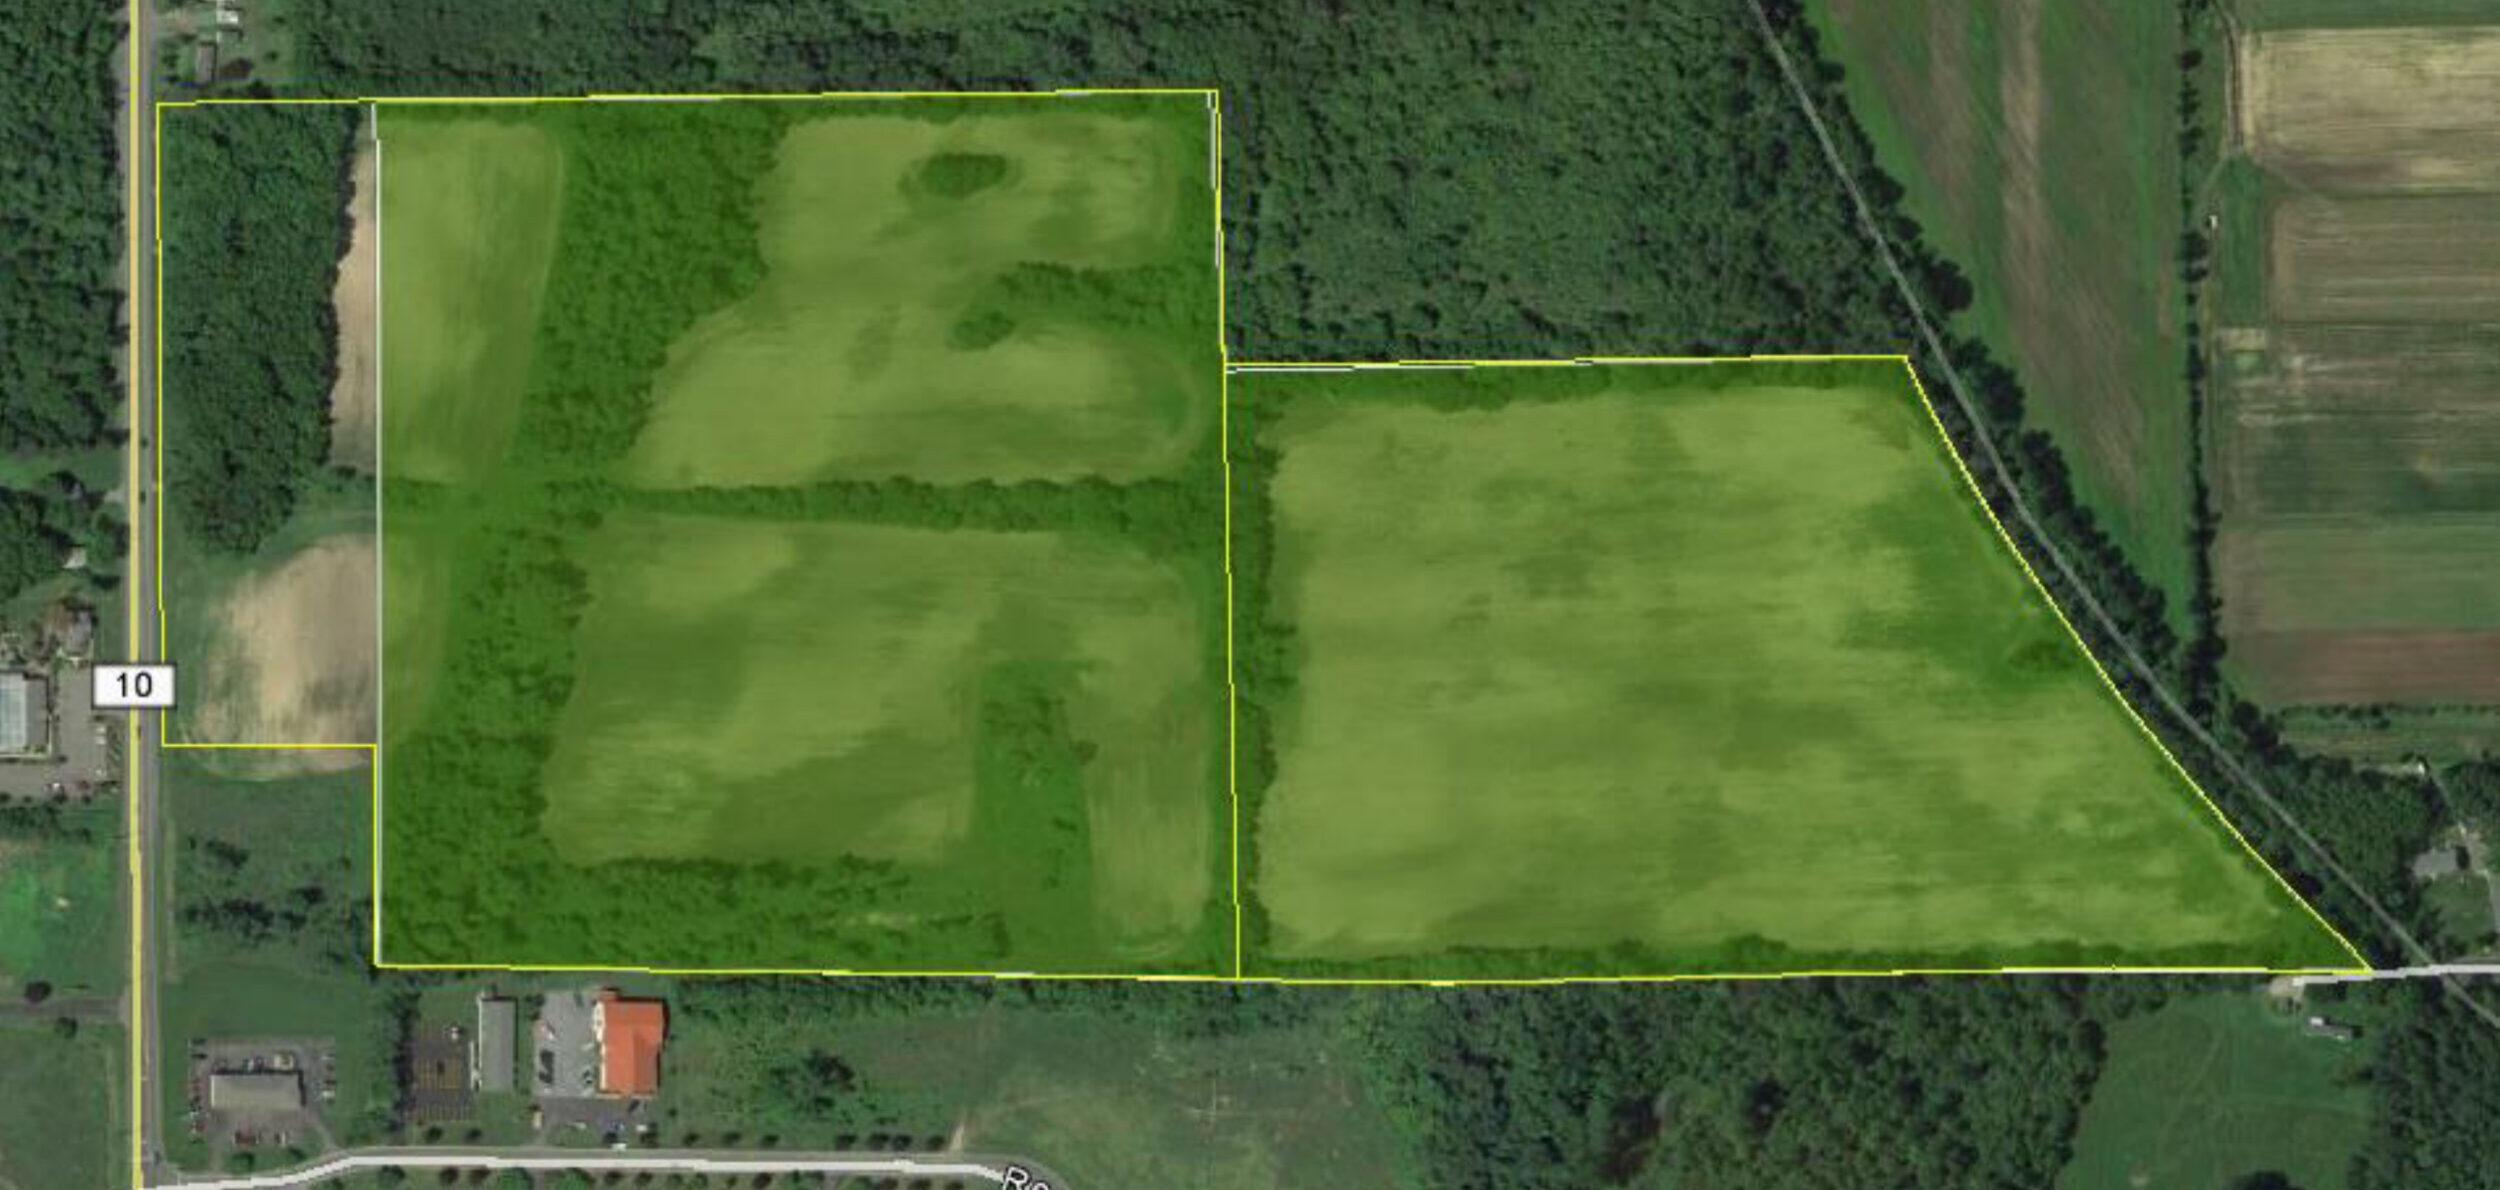 Chrisanntha Commercial Development Construction Oppportunities County Rd 10 Lot